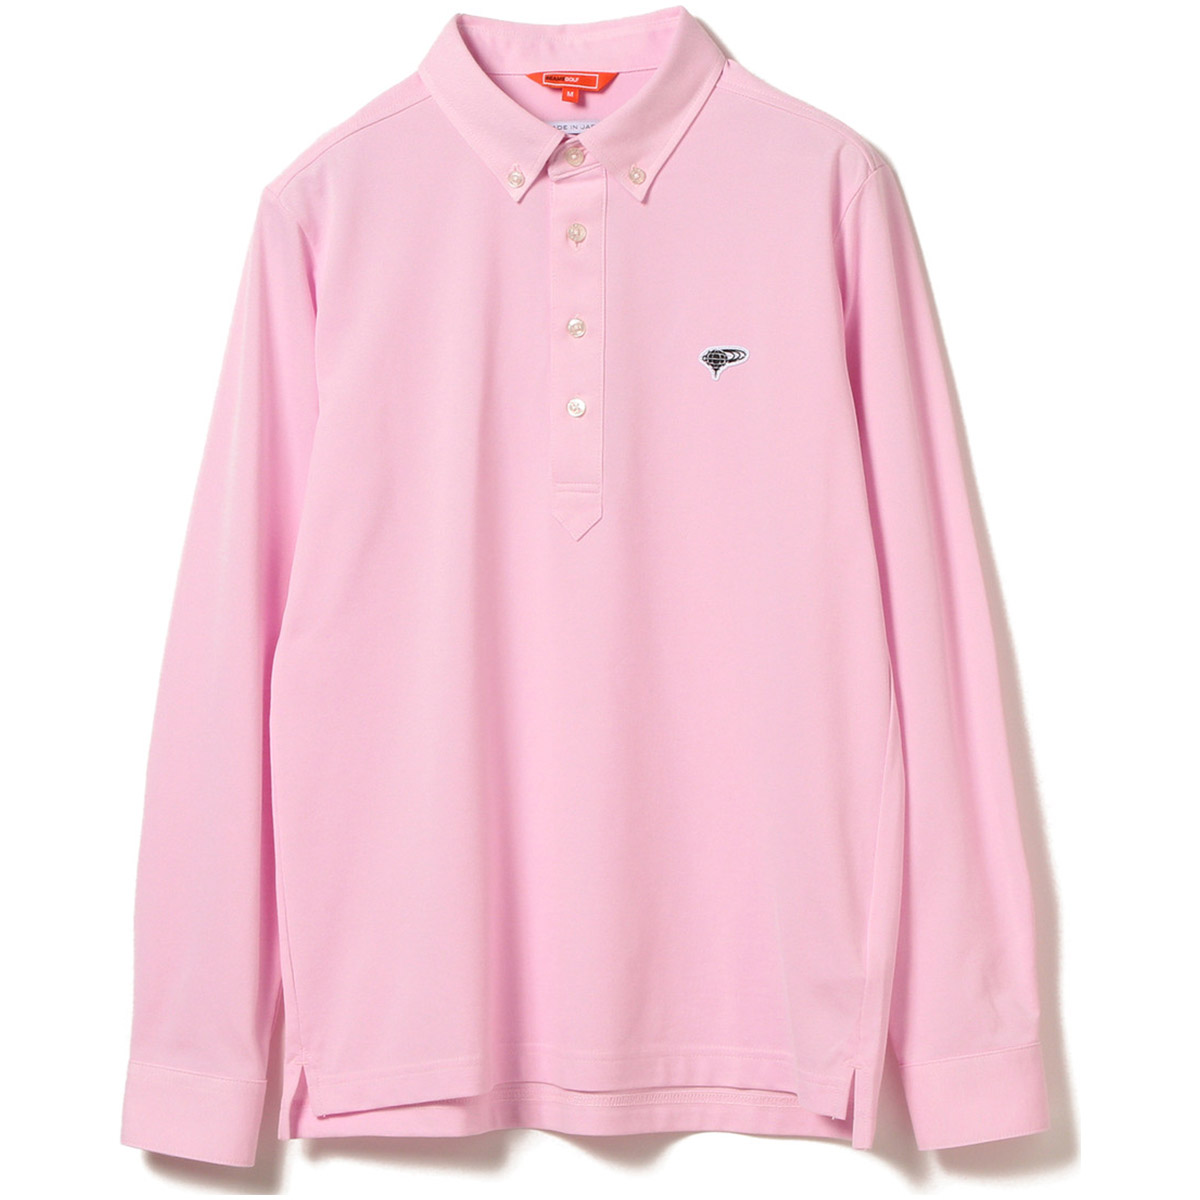 BEAMS GOLF ORANGE LABEL クールマックス プルオーバー ロングスリーブ ボタンダウン ポロシャツ